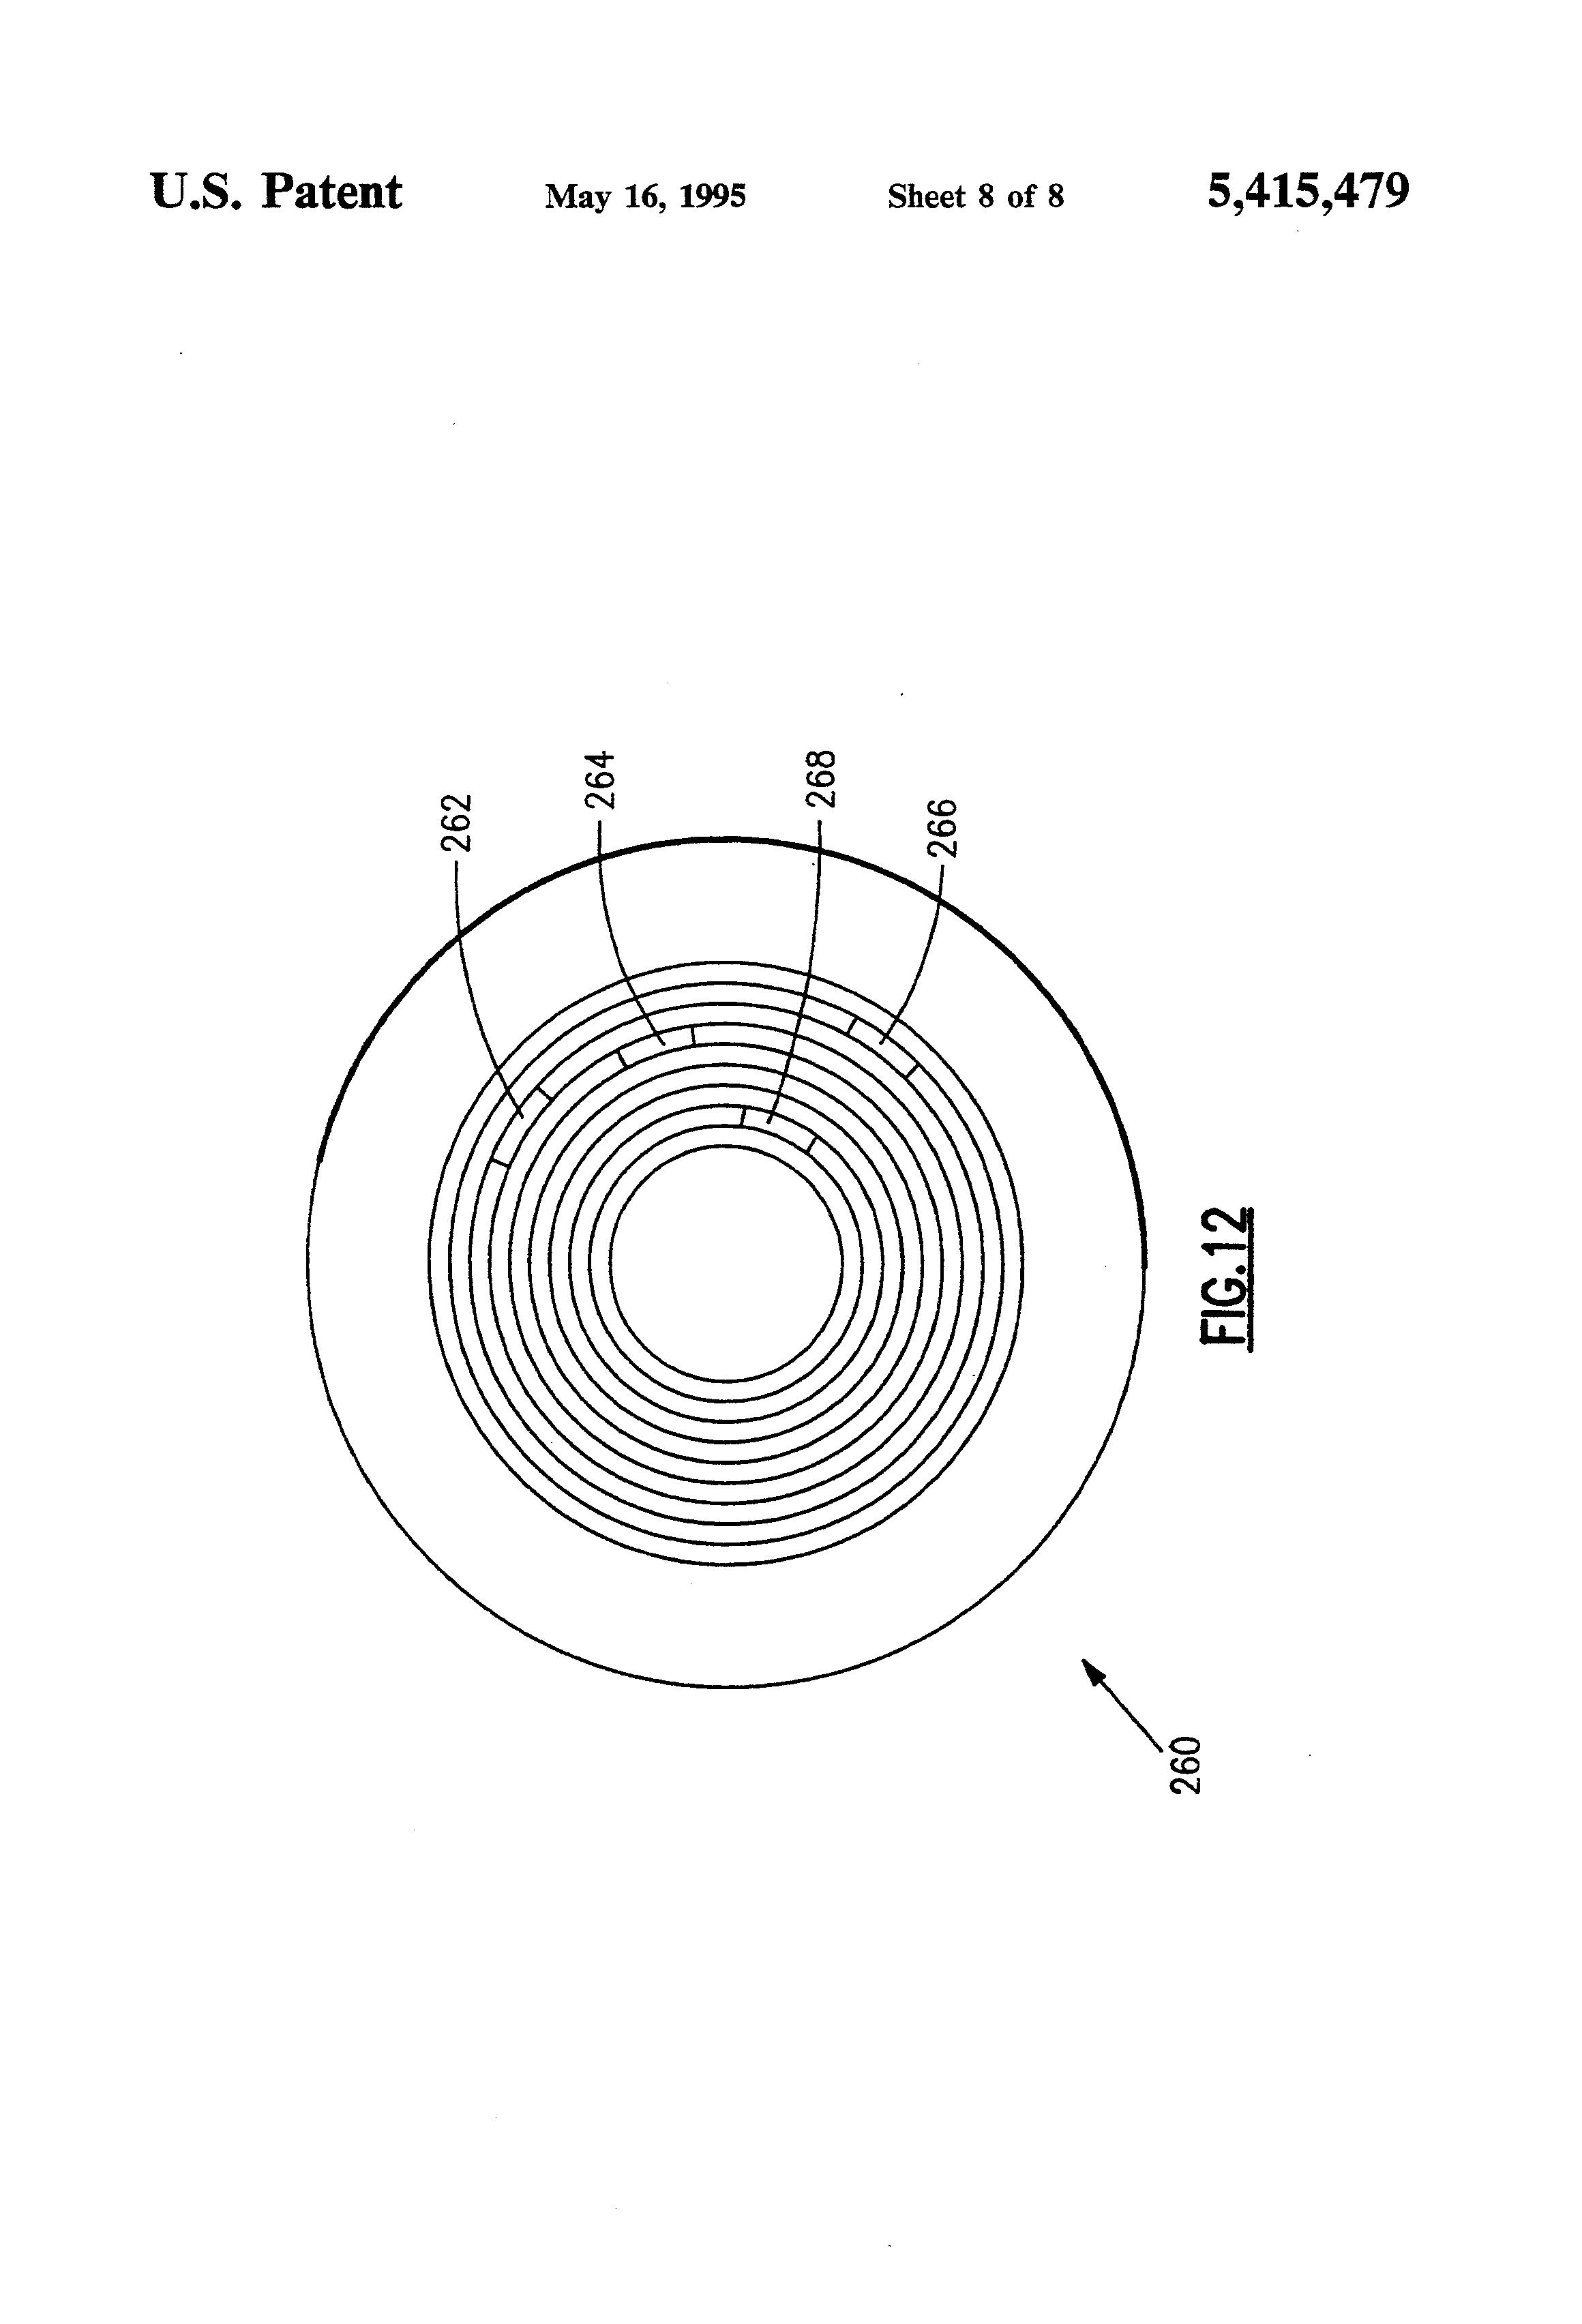 Patent US Postal Bar Code Printing With Engraved - Us zip code alphanumeric